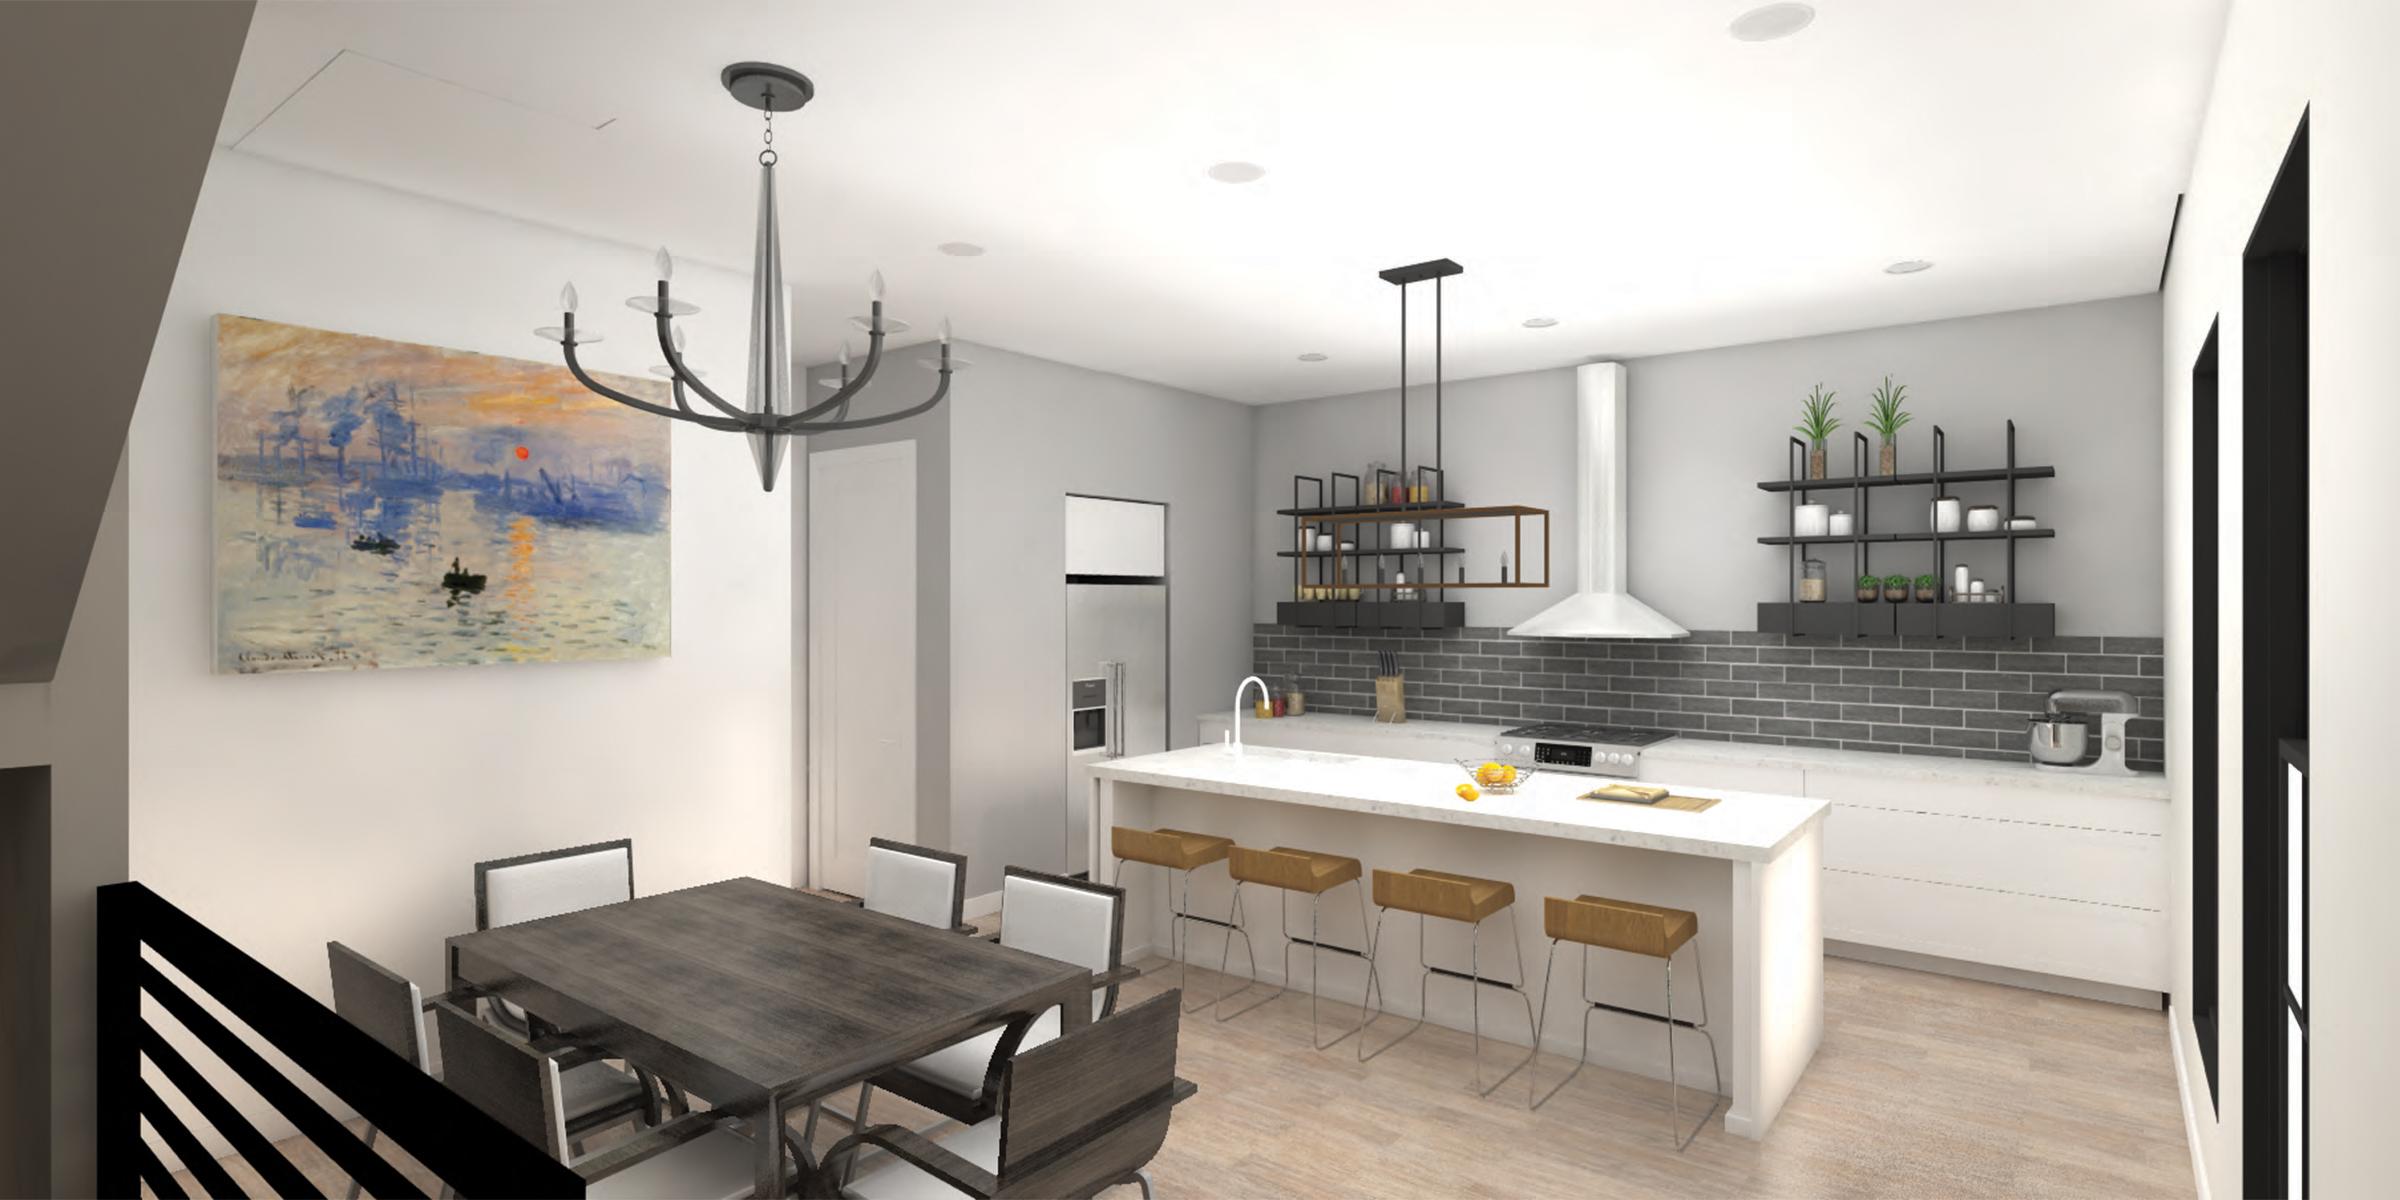 bryden_row_interior_rendering_1.jpg